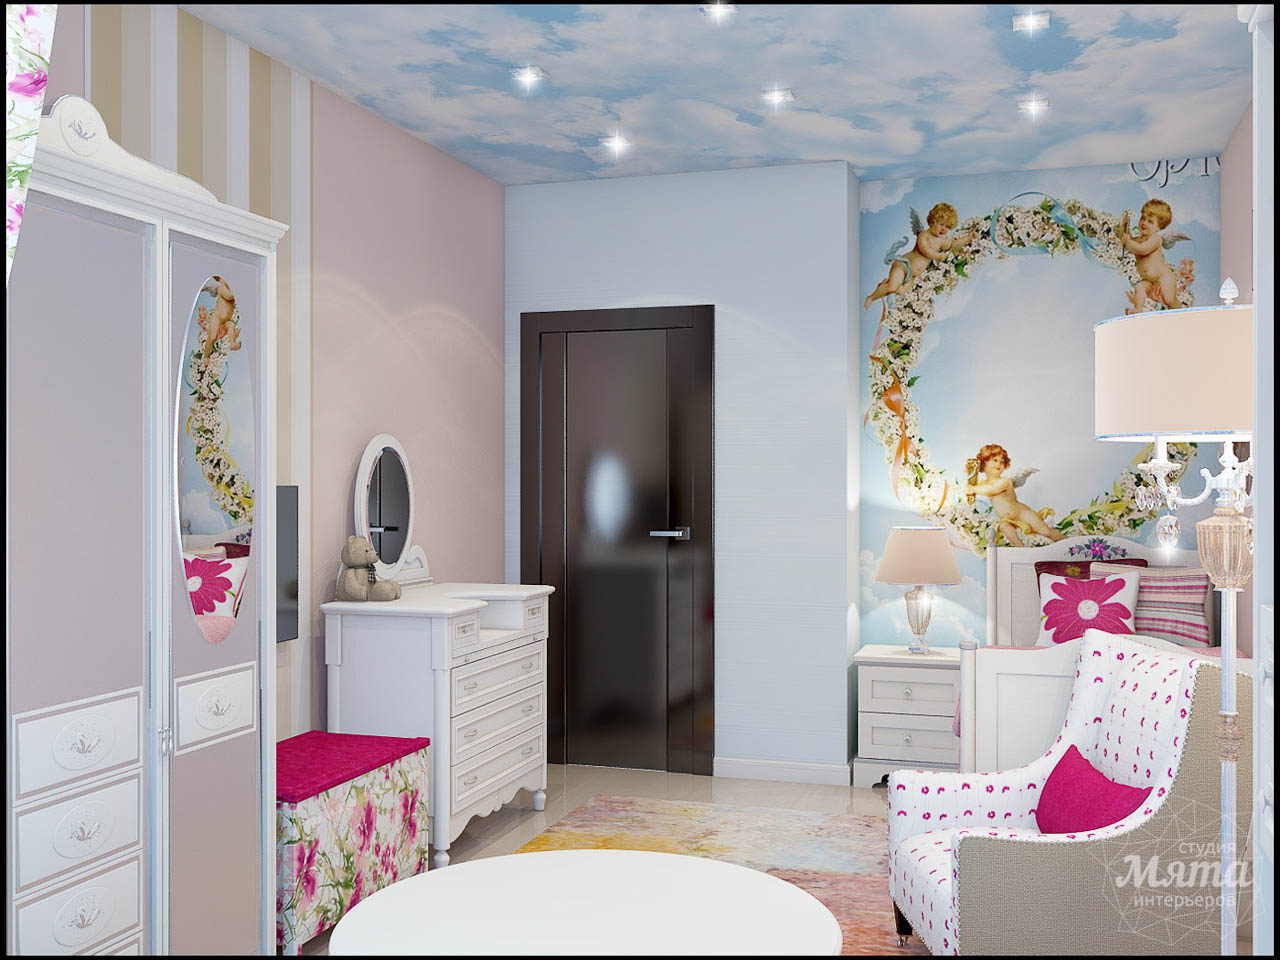 Дизайн интерьера и ремонт трехкомнатной квартиры по ул. 8 Марта 190 img1978437677